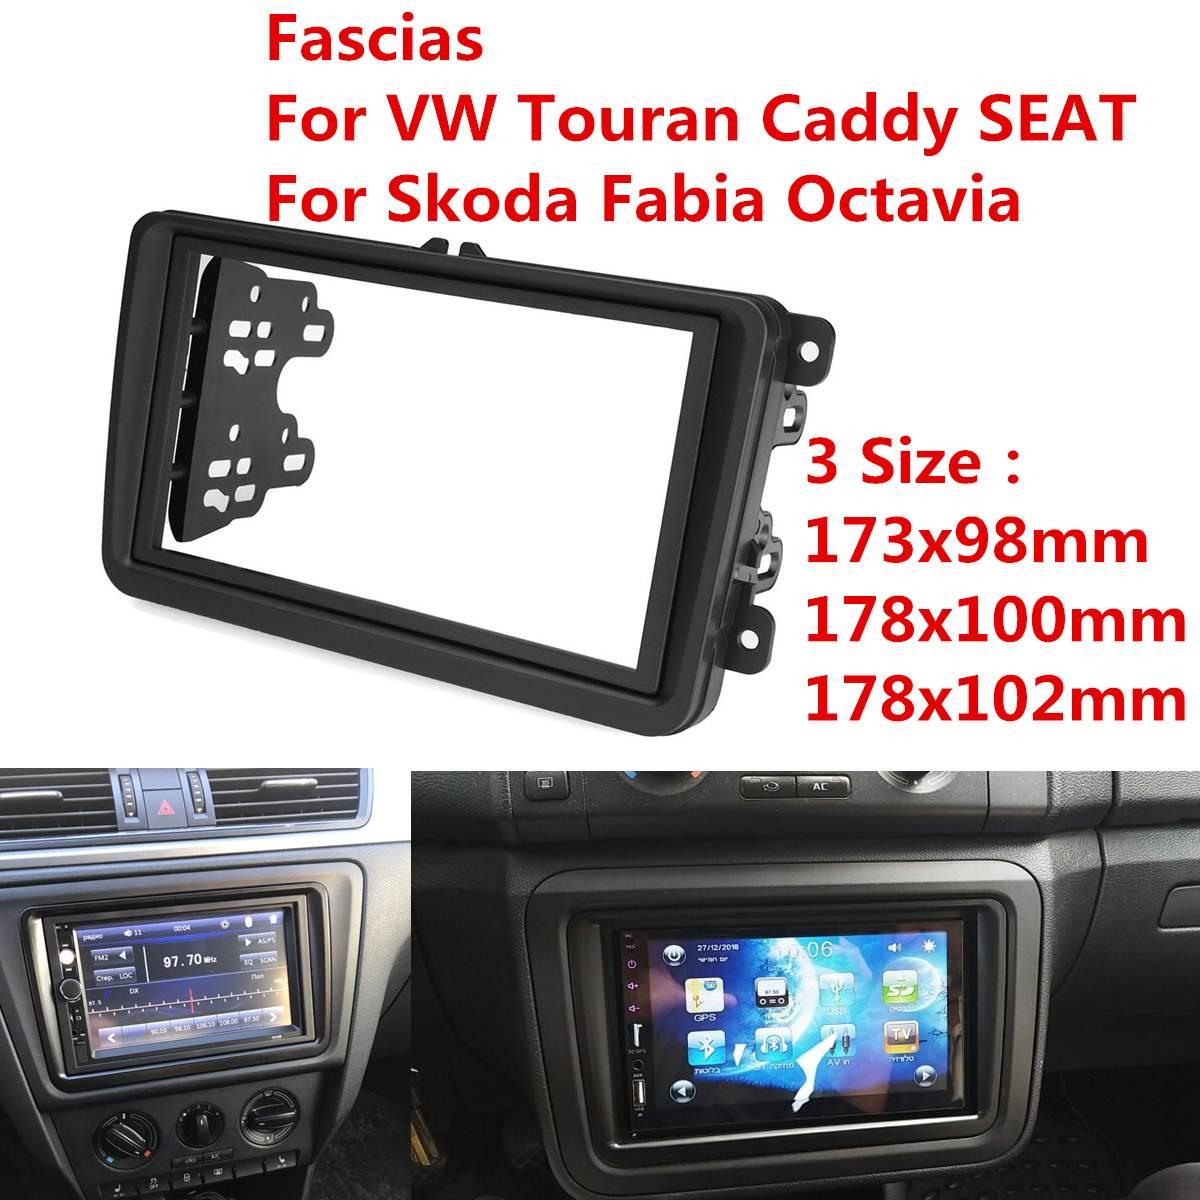 2 Din Auto Radio Fascia Fascias Panel Frame CD DVD Dash Audio Interieur voor Volkswagen VW Touran Caddy SEAT Skoda fabia Octavia